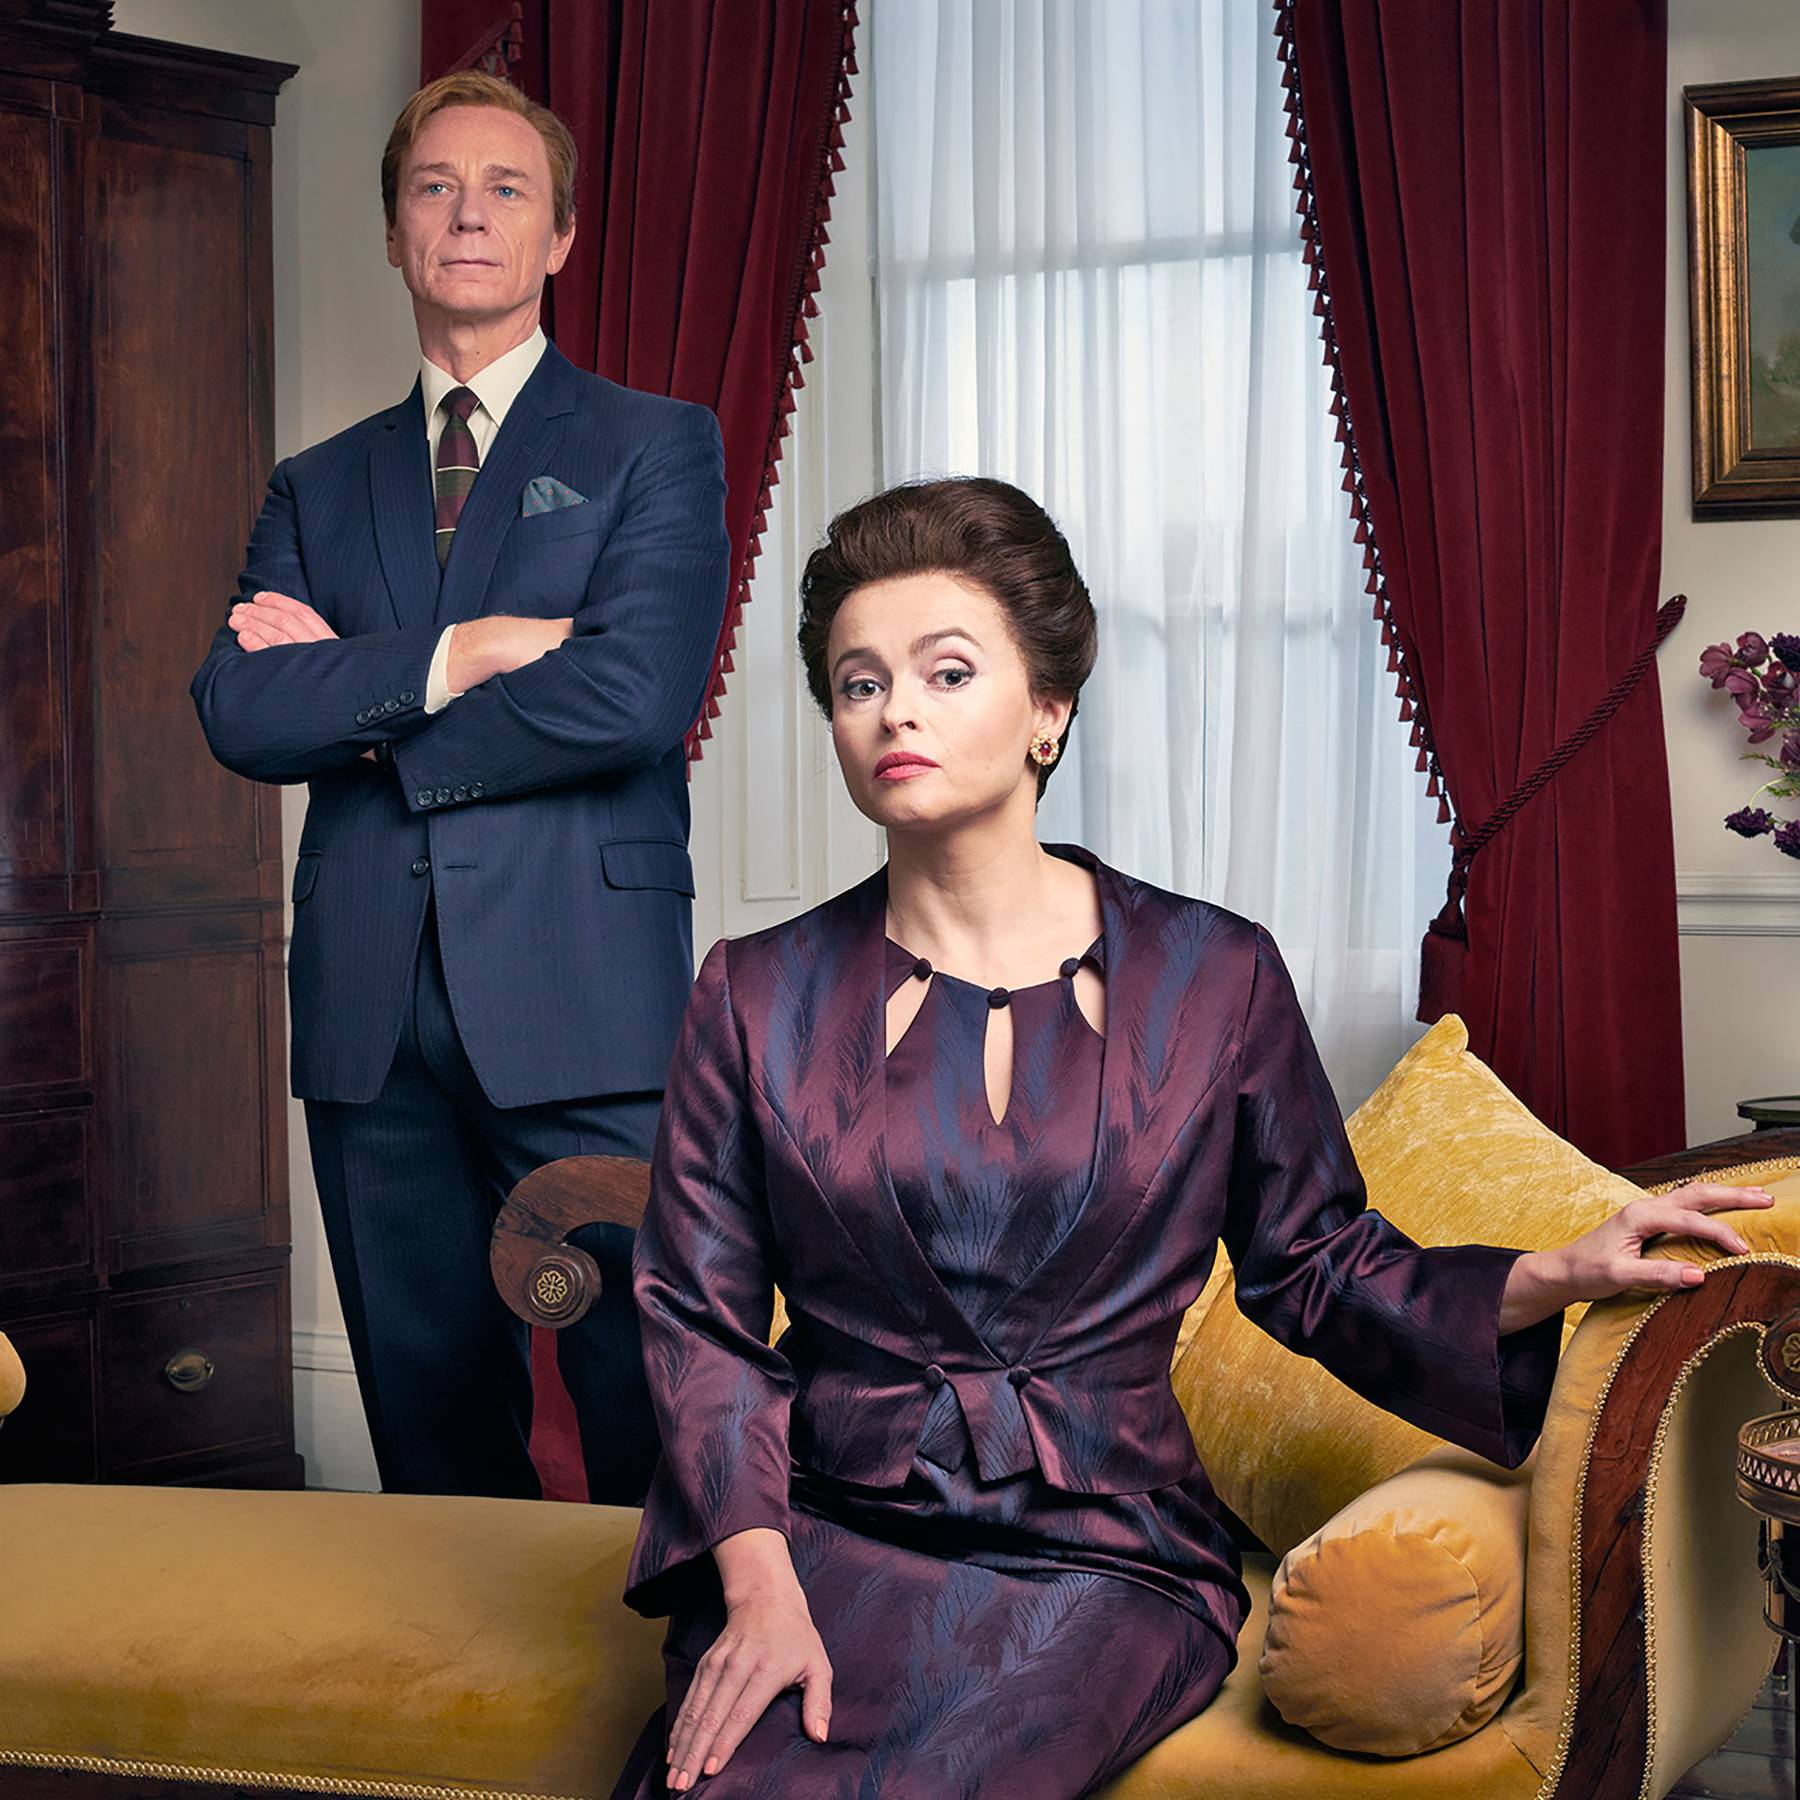 'The Crown' star Helena Bonham Carter's celebrity sleepover at Buckingham Palace